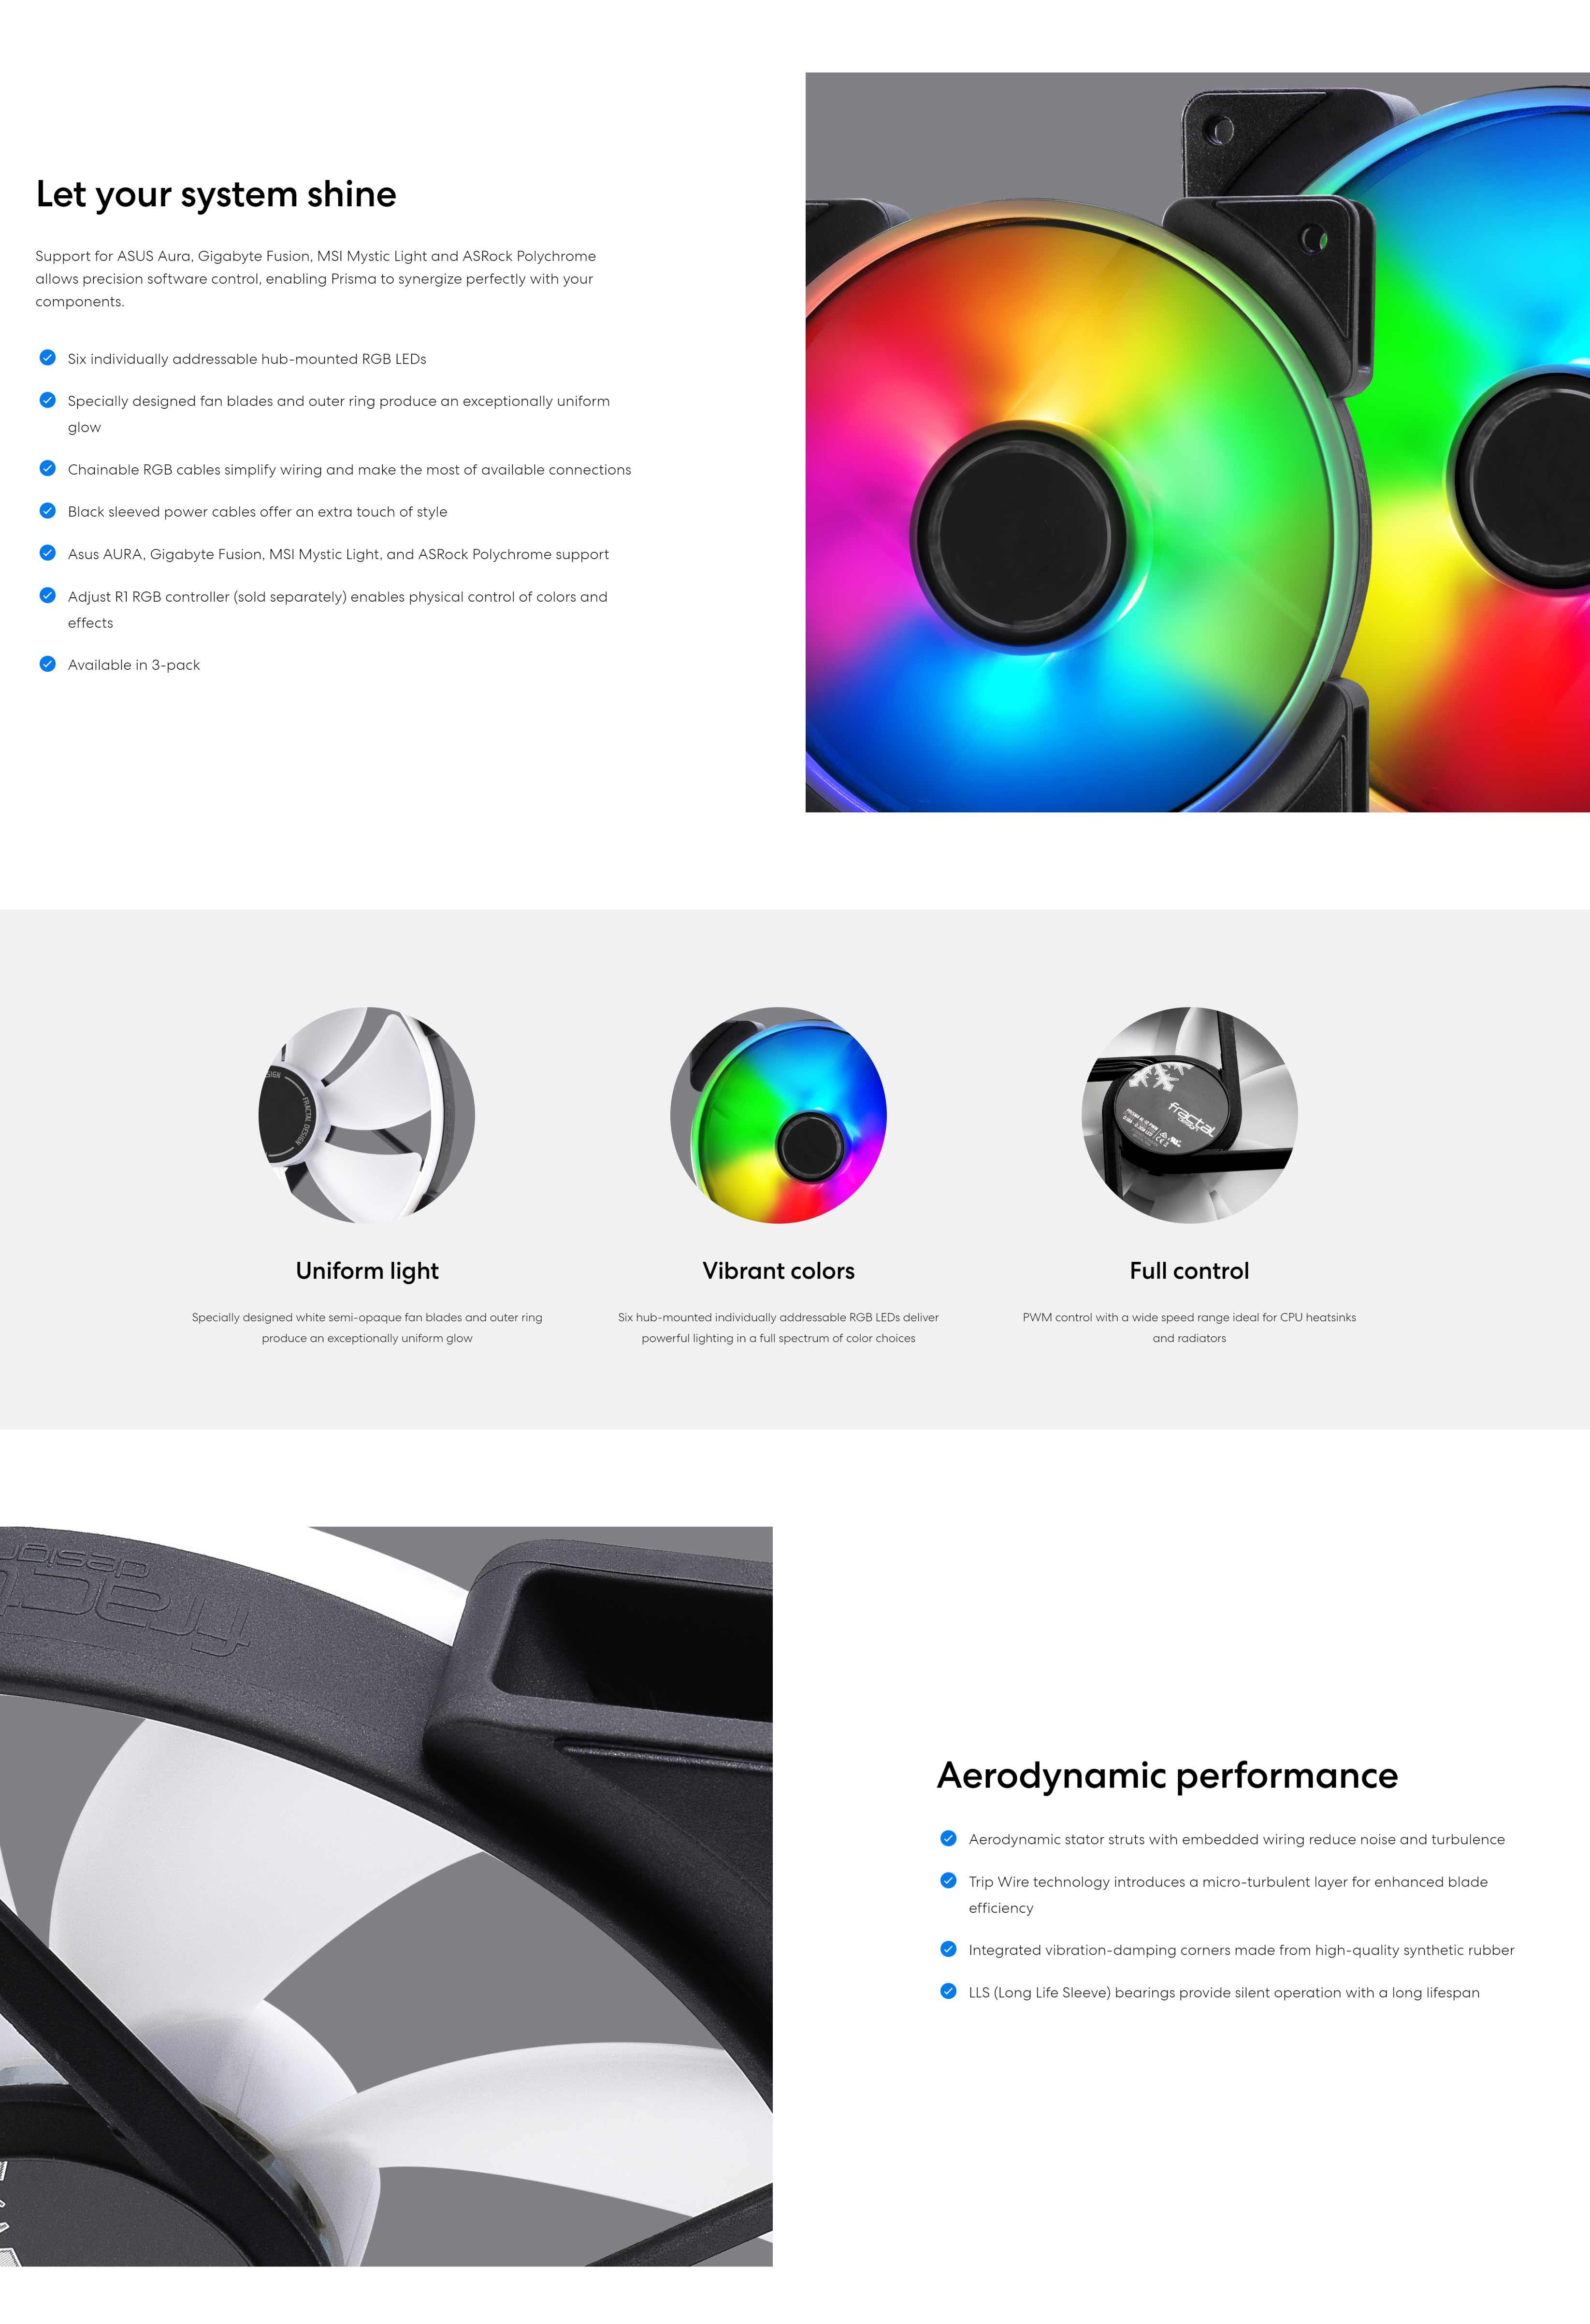 screencapture-fractal-design-products-fans-prisma-prisma-al-12-pwm-rgb-2020-02-12-14_58_43.jpg